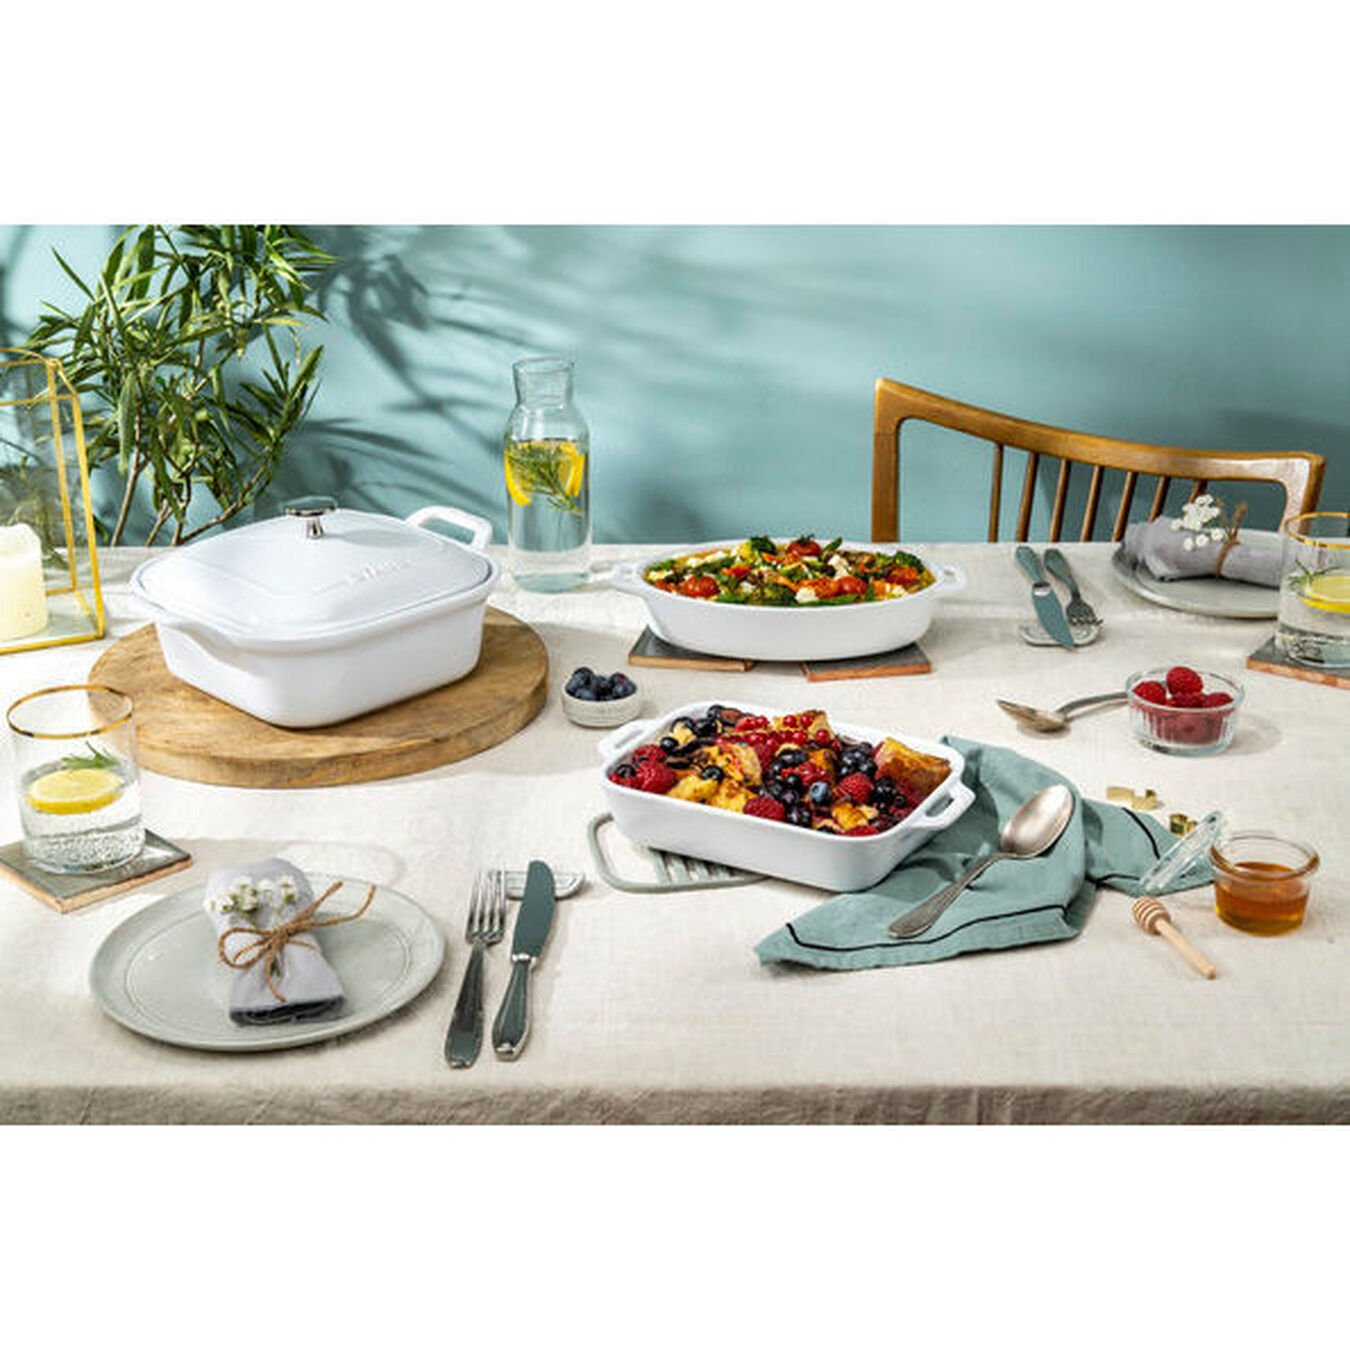 Ovenware set, 4 Piece | white,,large 6